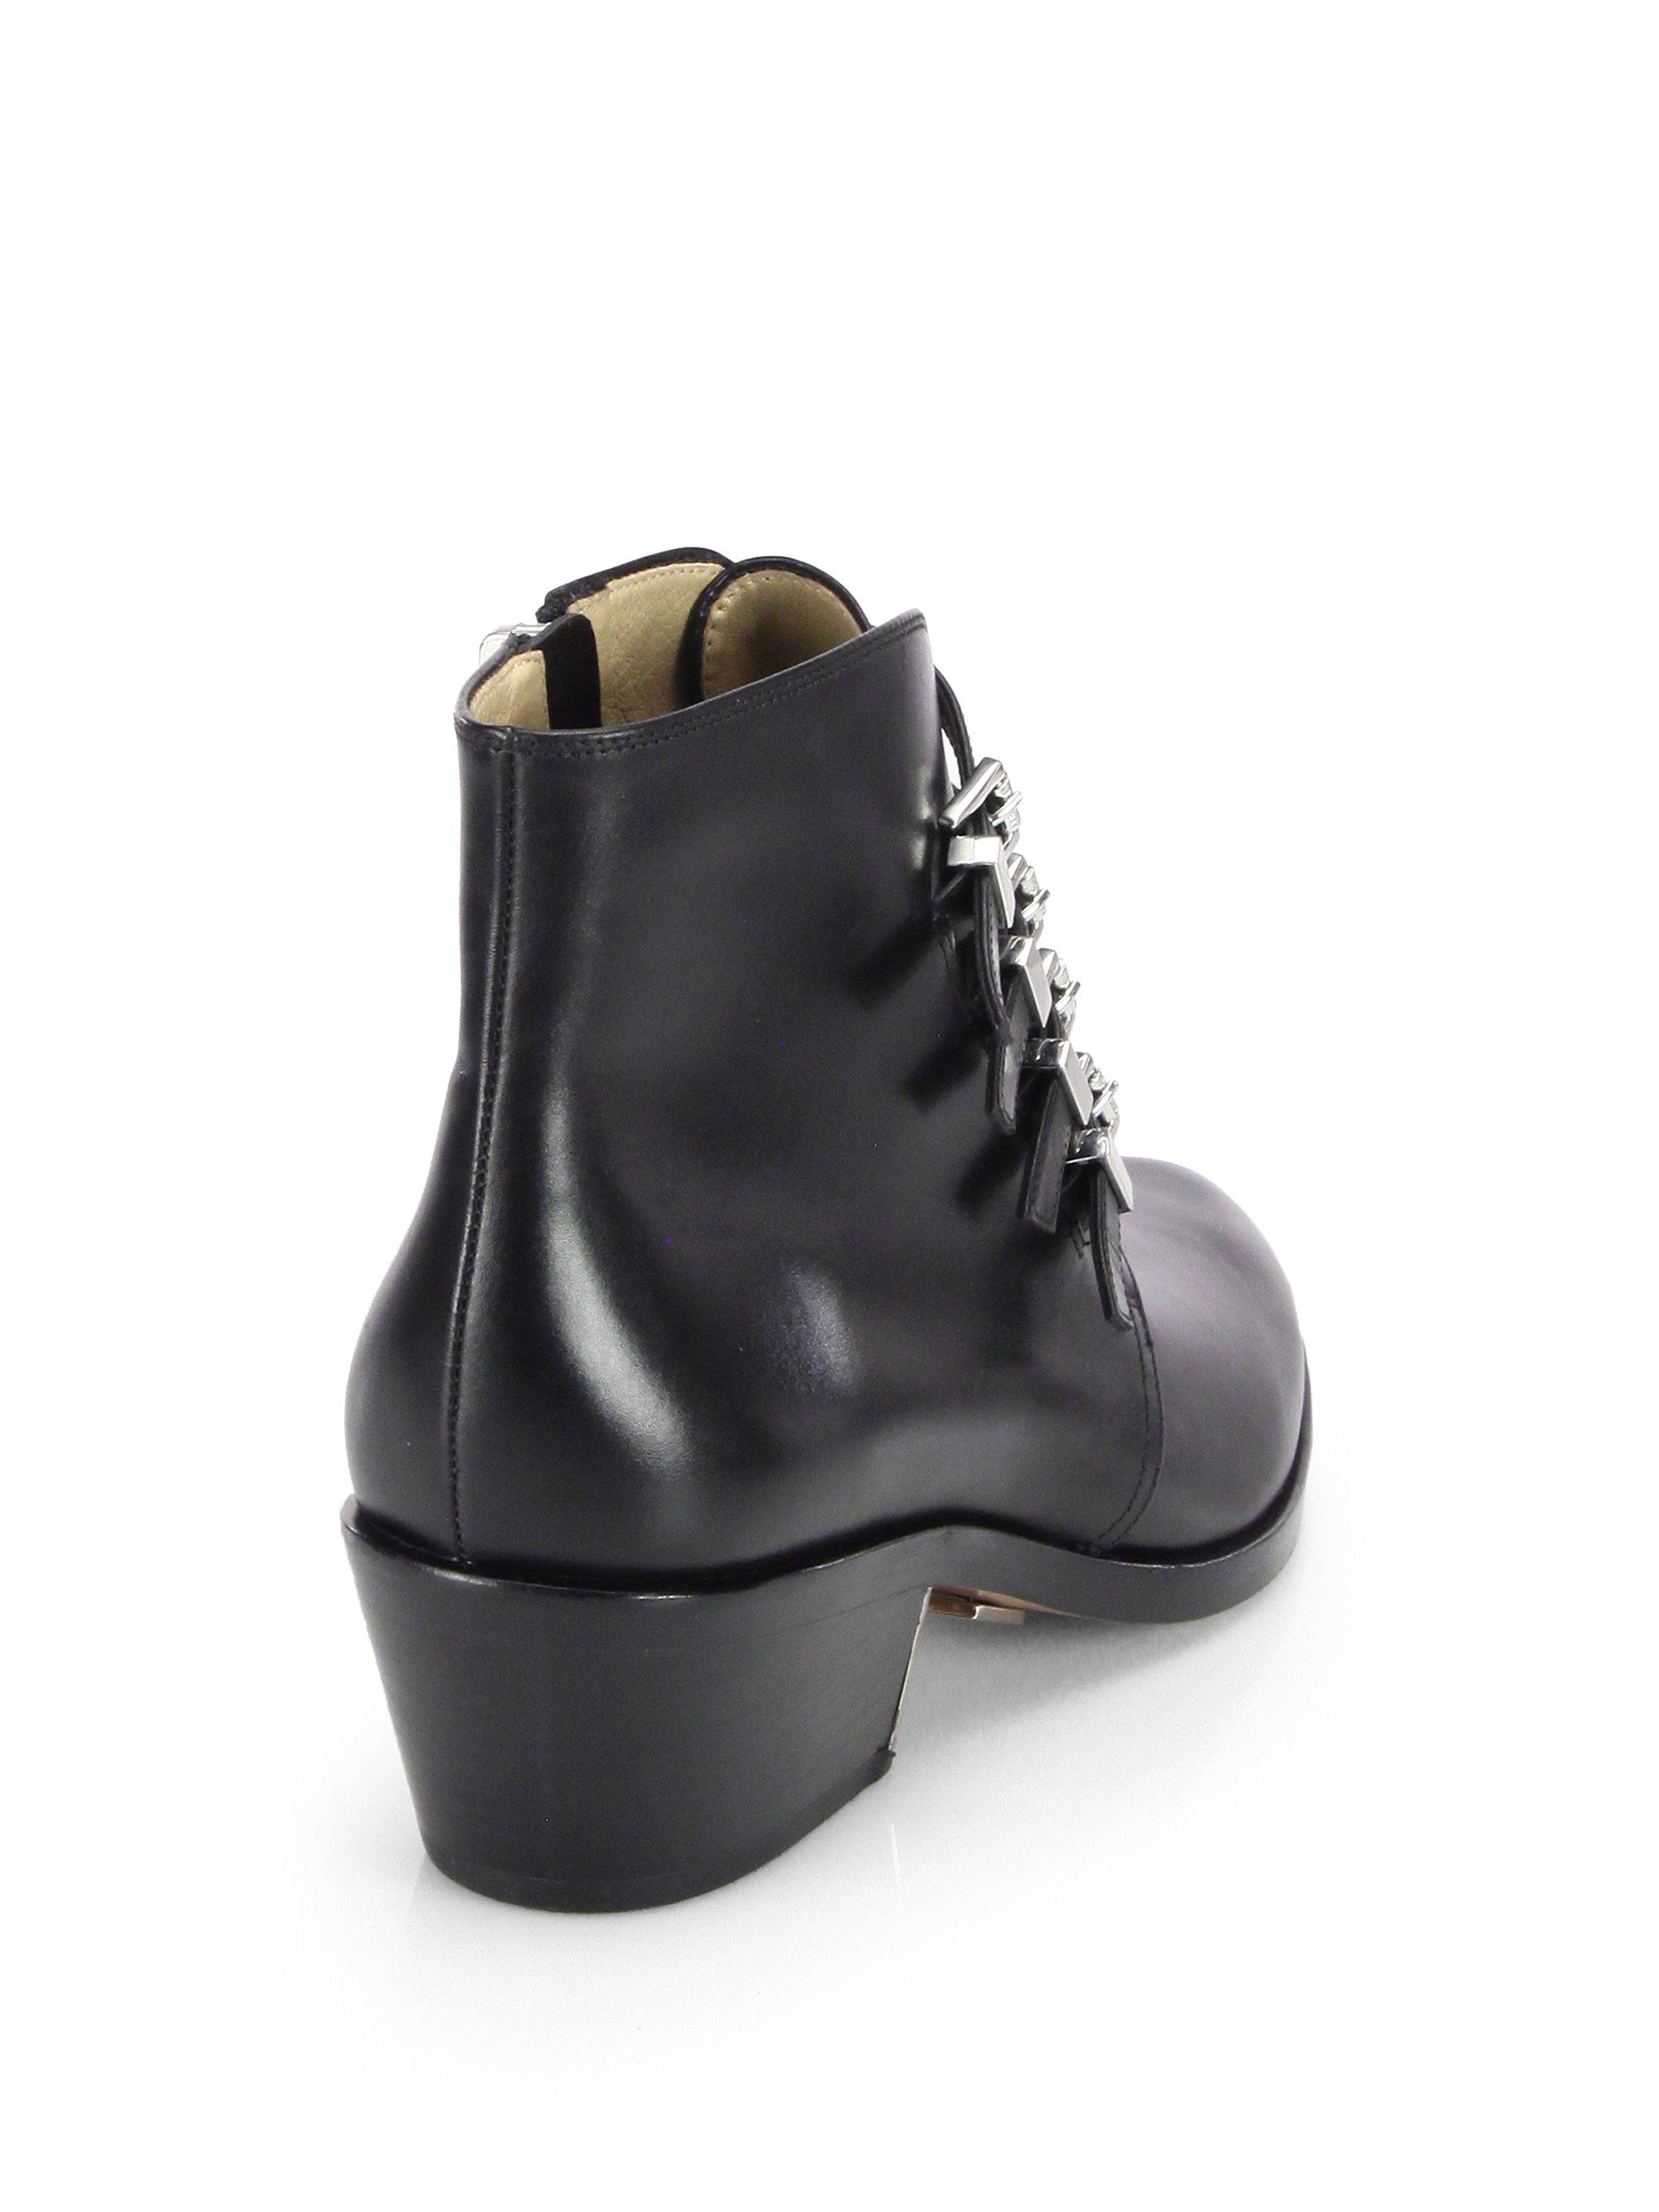 Michael Kors Boots Womens - Michael Kors Peggie Black